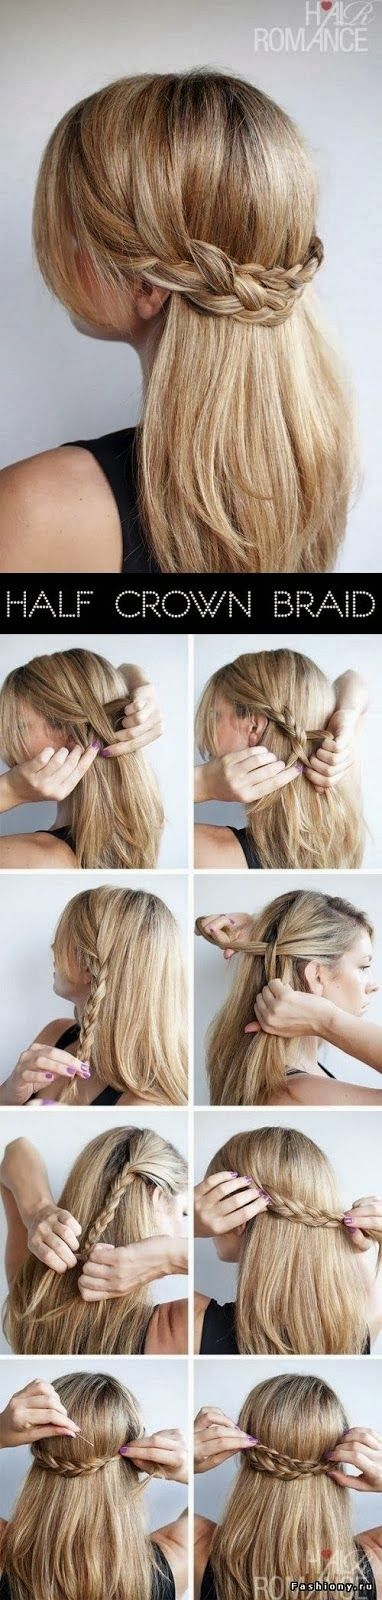 Pretty Braided Half Updo Hairstyle Tutorial